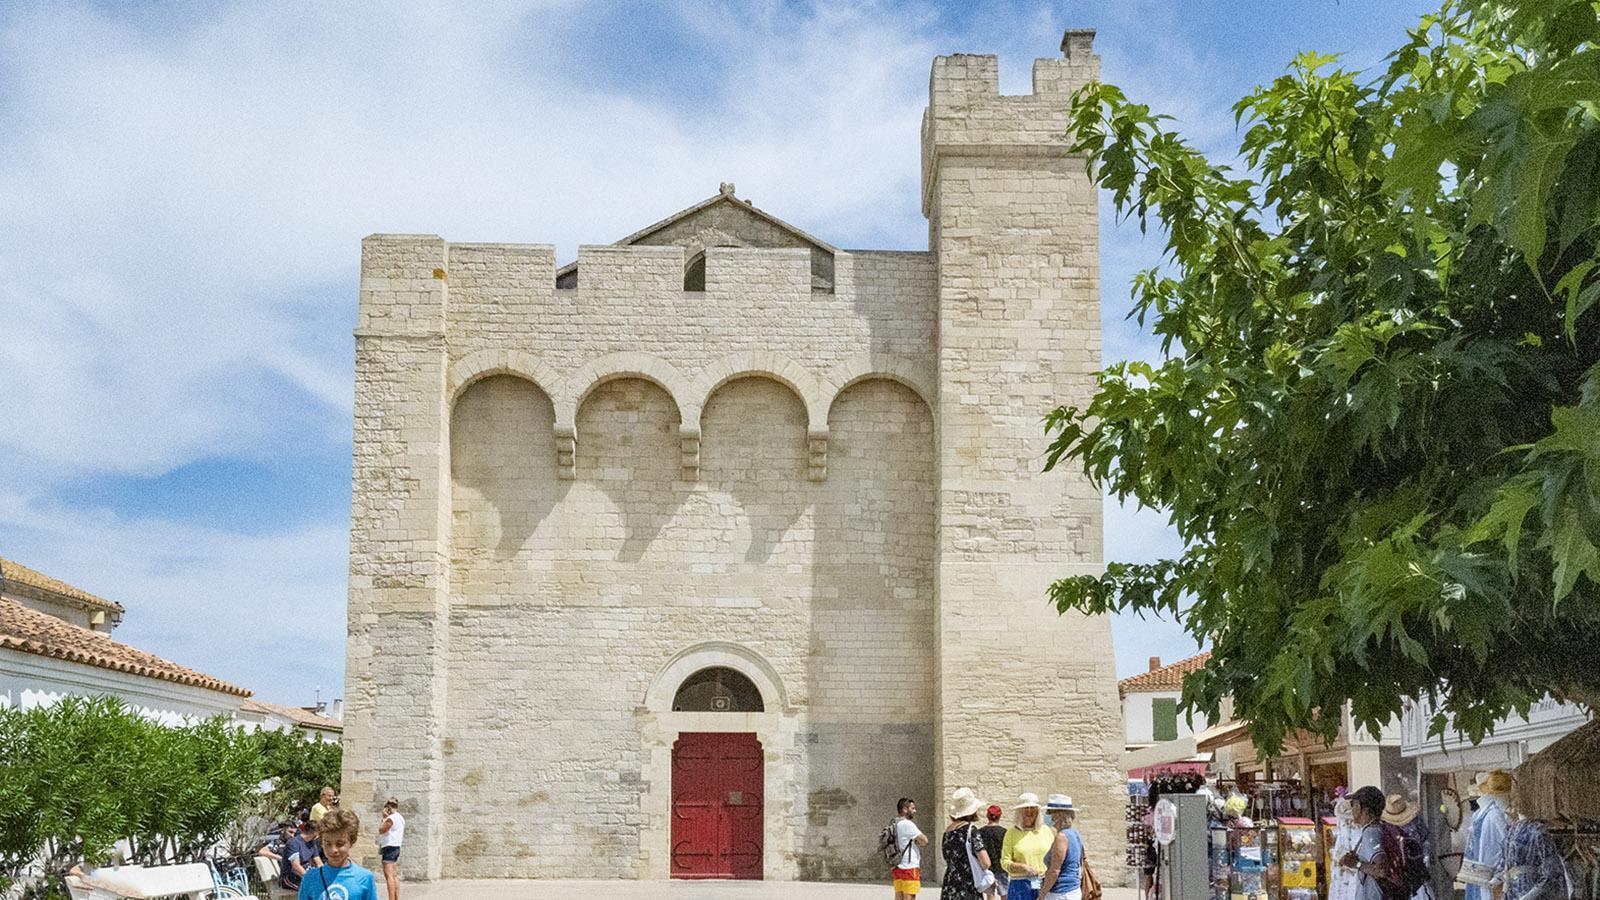 Die Pfarrkirche von Les Saintes-Maries-de-la-Mer. Foto: Hilke Maunder